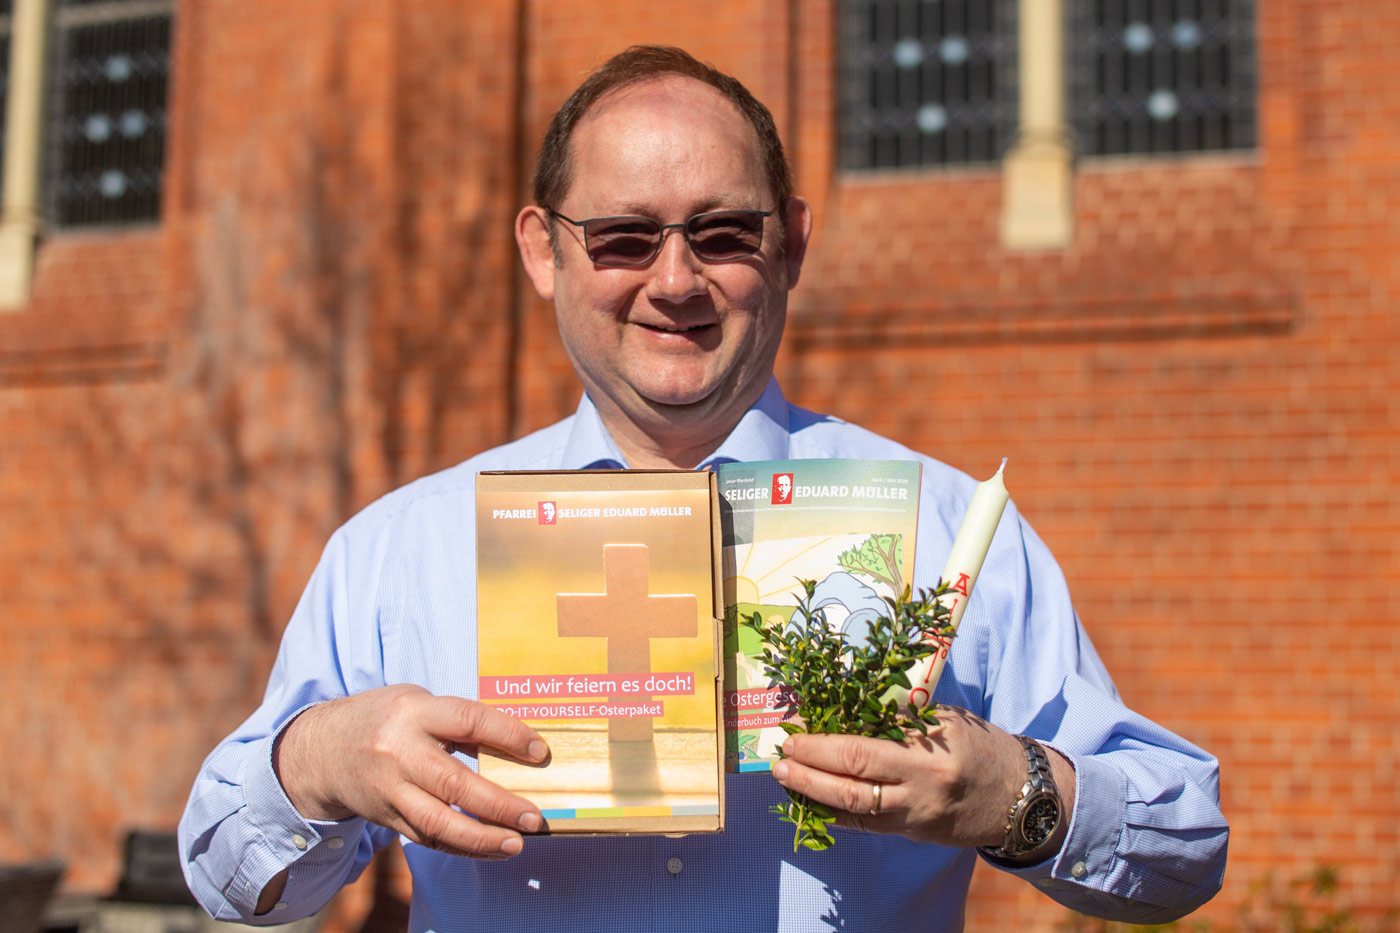 Pfarrer Peter Wohs präsentiert die Osterbox der Pfarrei Seliger Eduard Müller